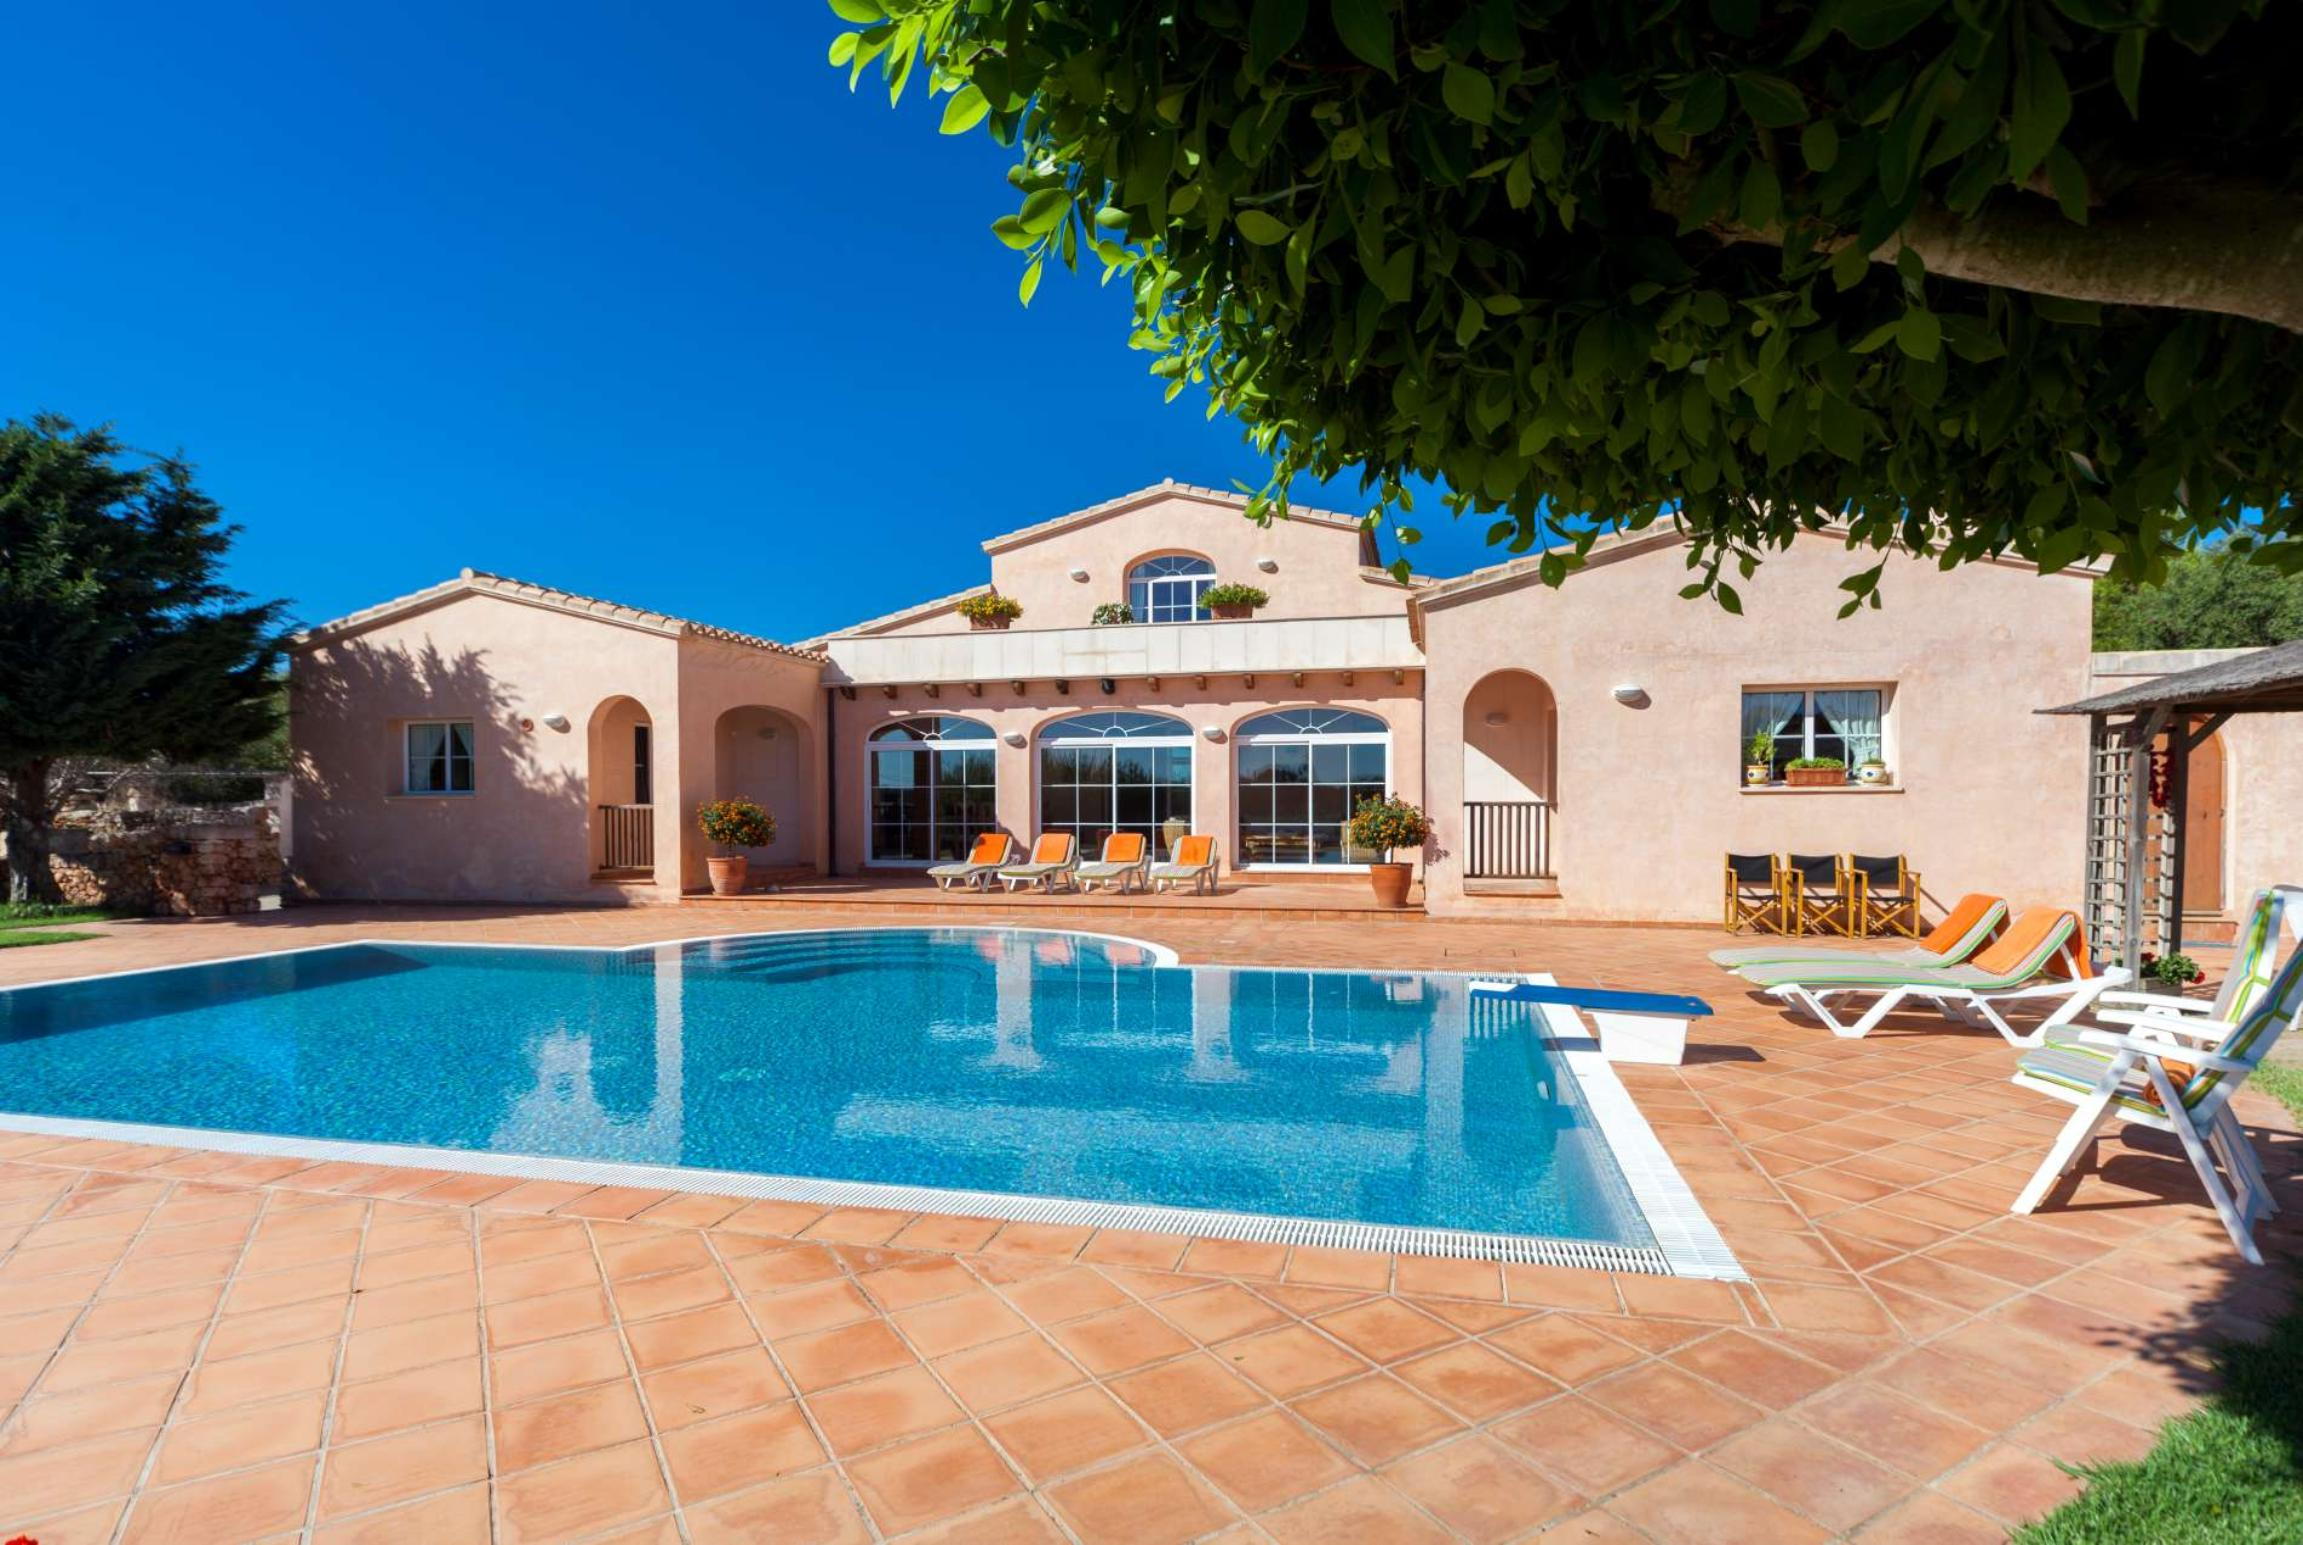 Ferienhaus Villa Estrellita (2649653), Punta Prima, Menorca, Balearische Inseln, Spanien, Bild 25